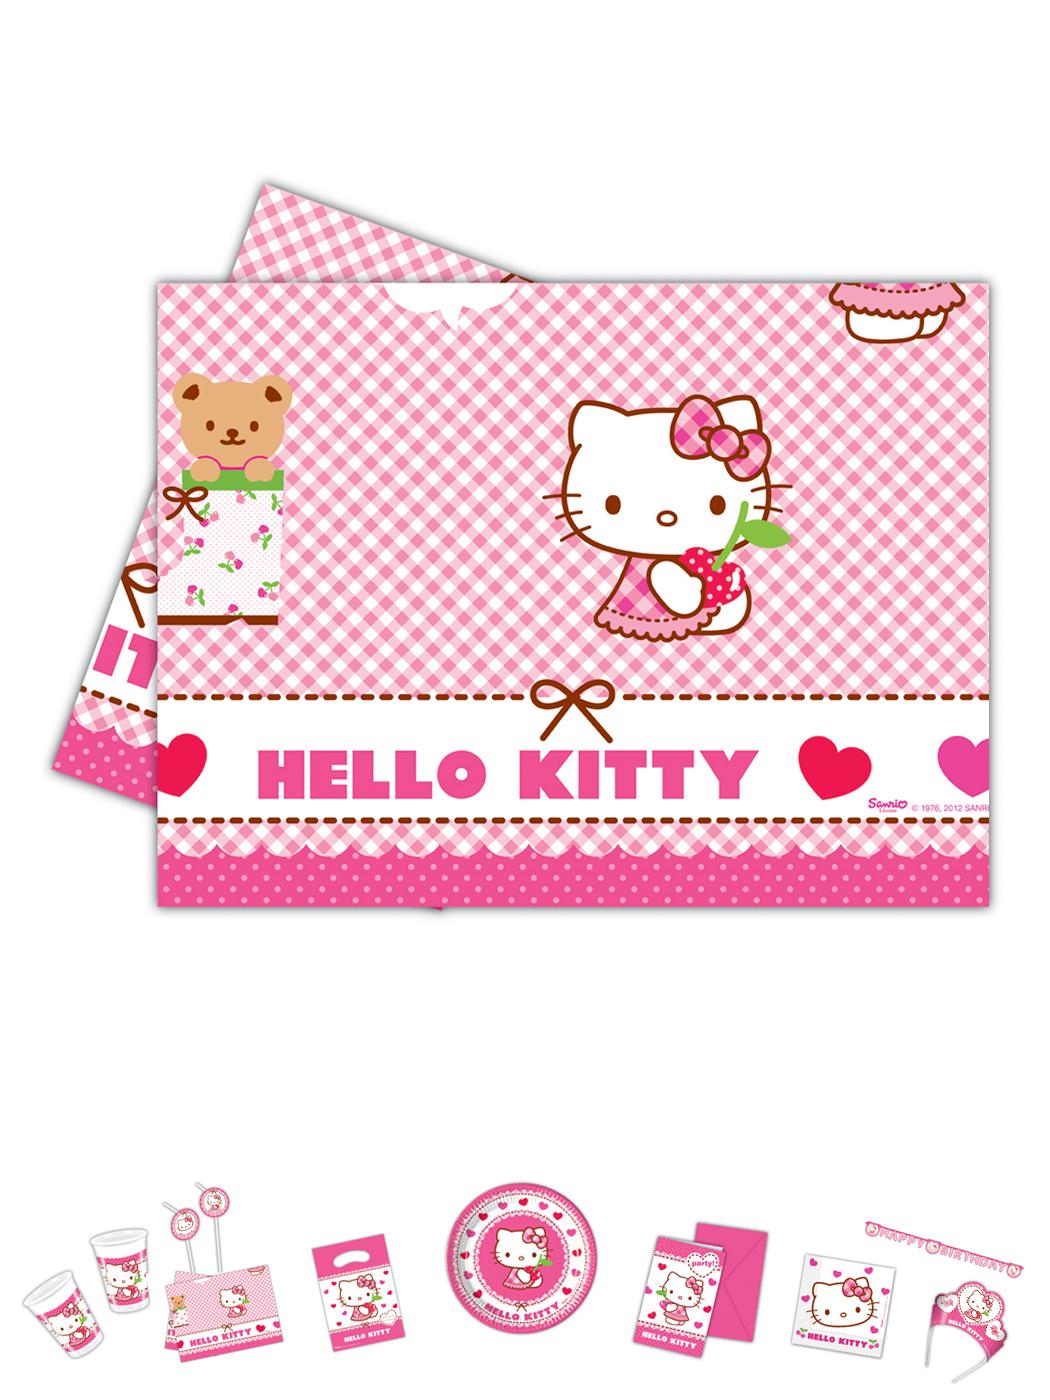 Hello Kitty Plastik Tischdecke 1Stck. P81795--